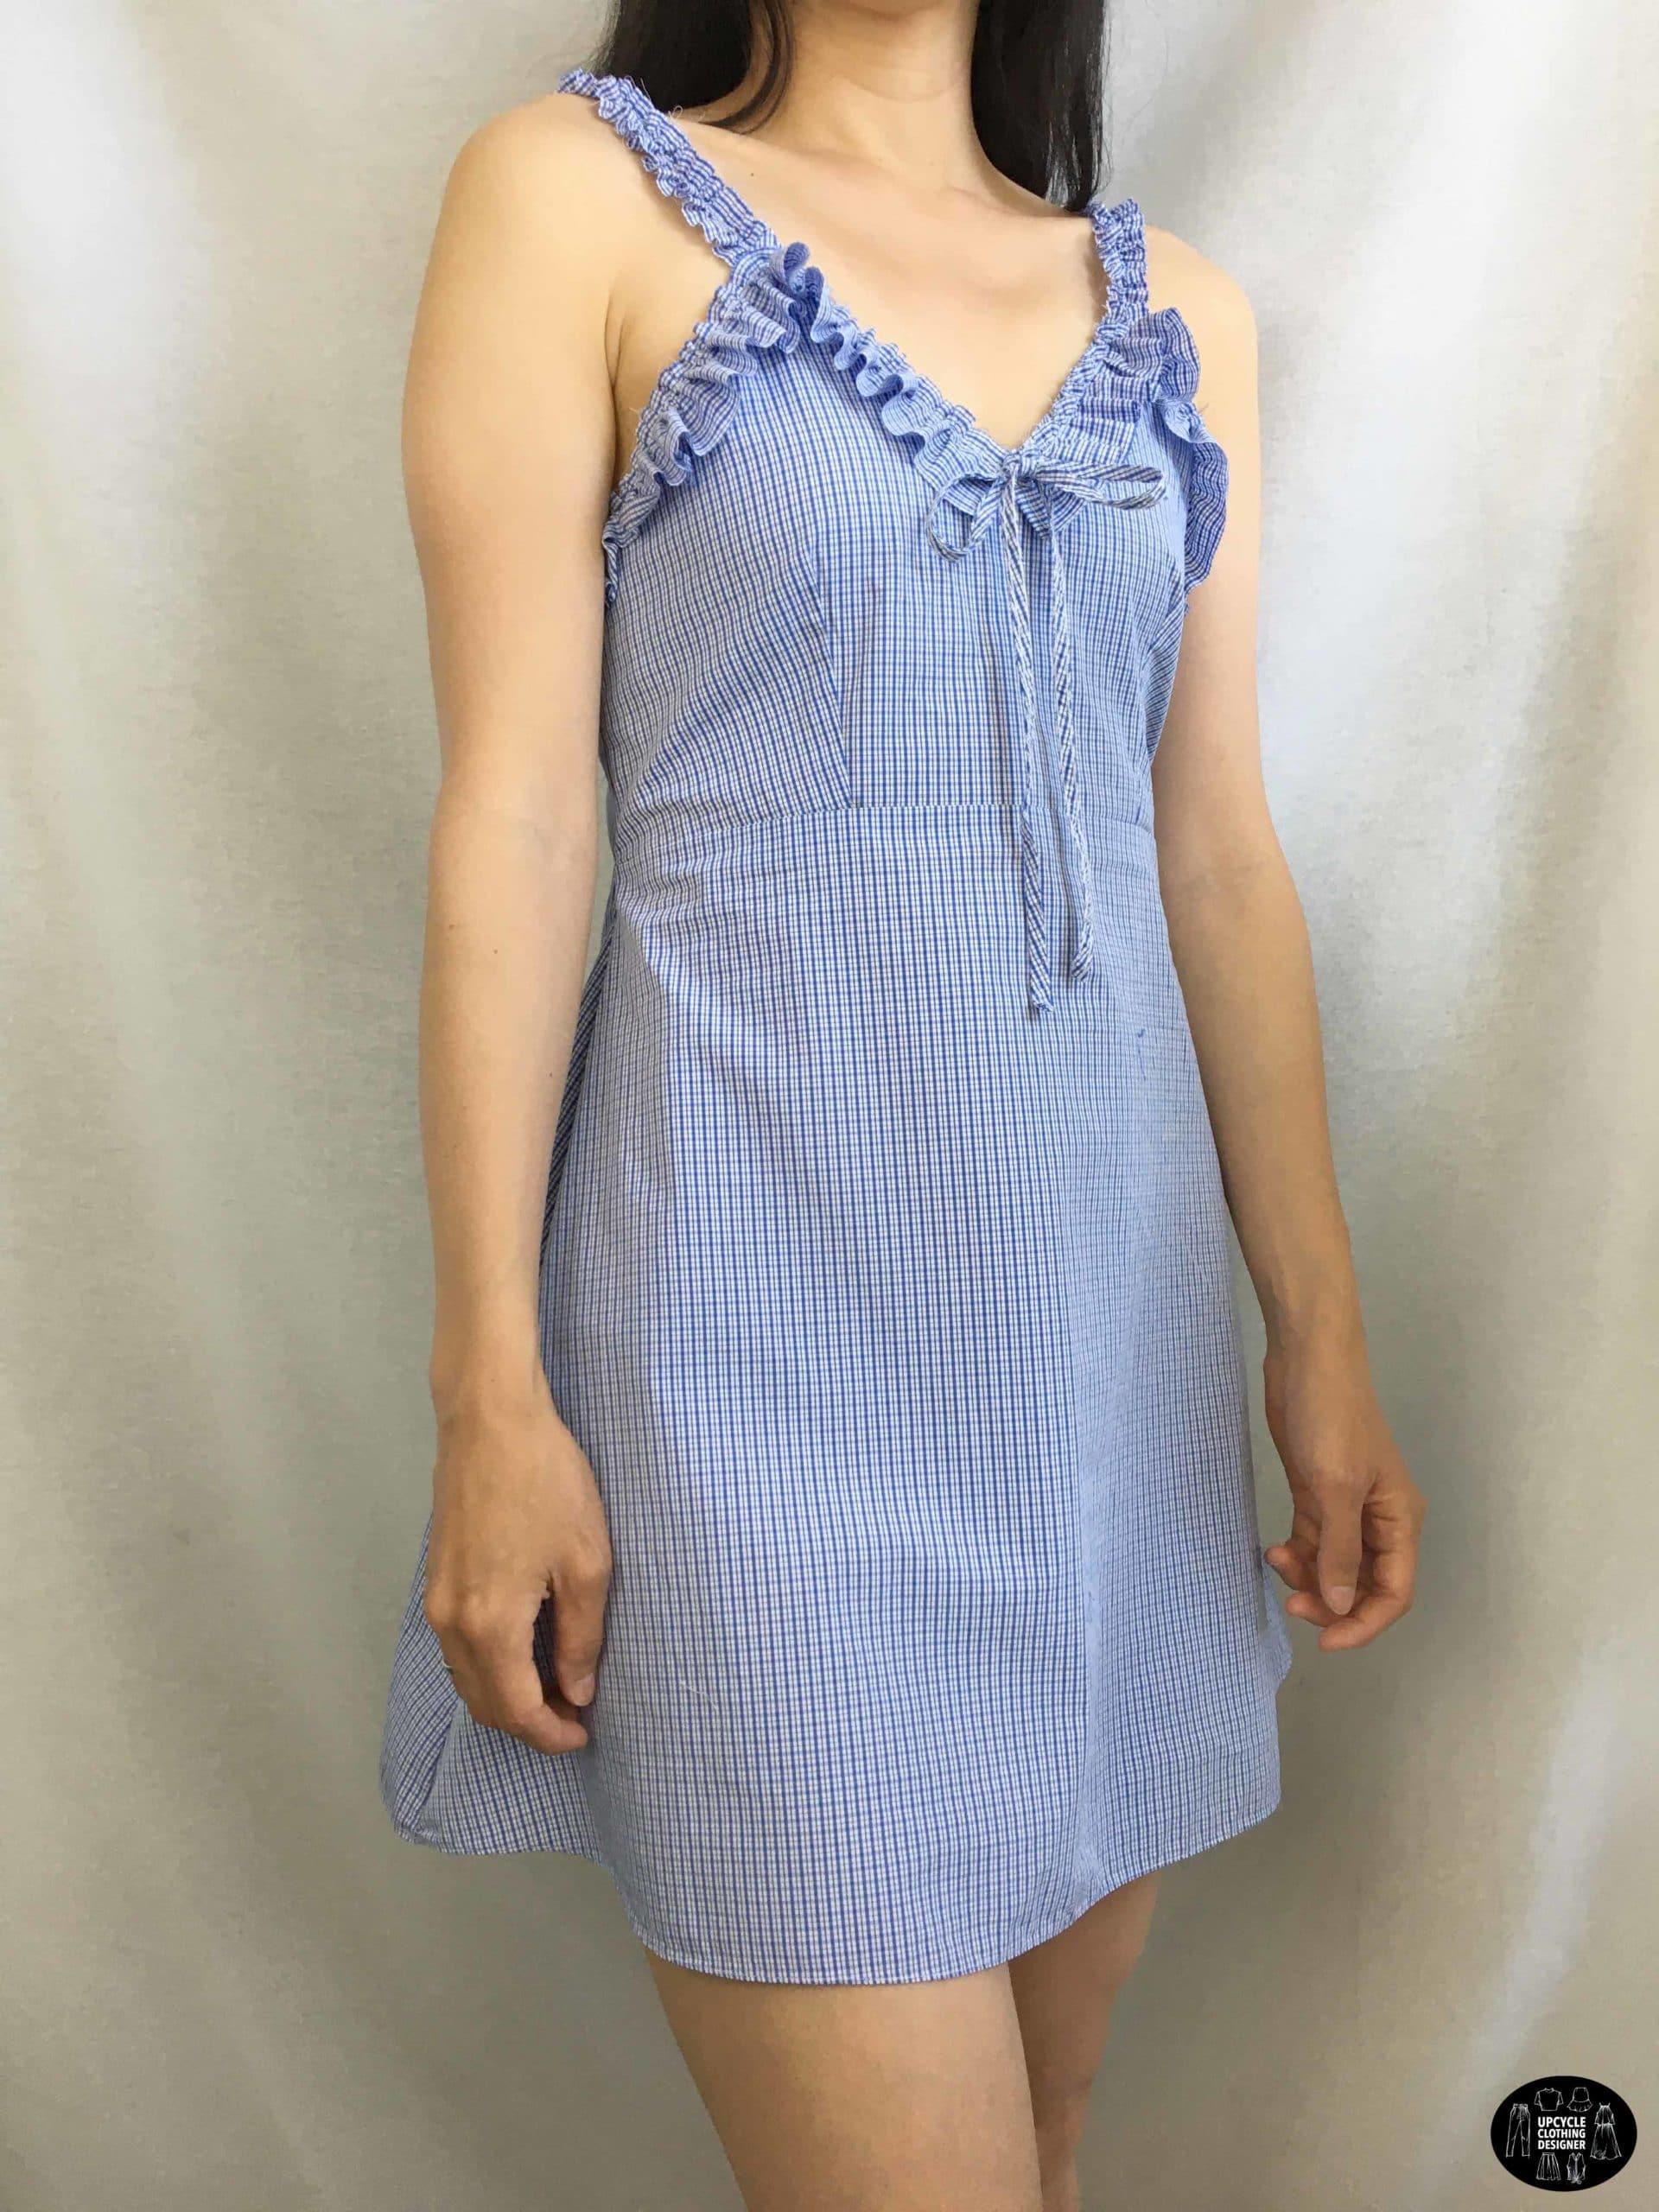 Ruffle shoulder dress from men's shirt sideview